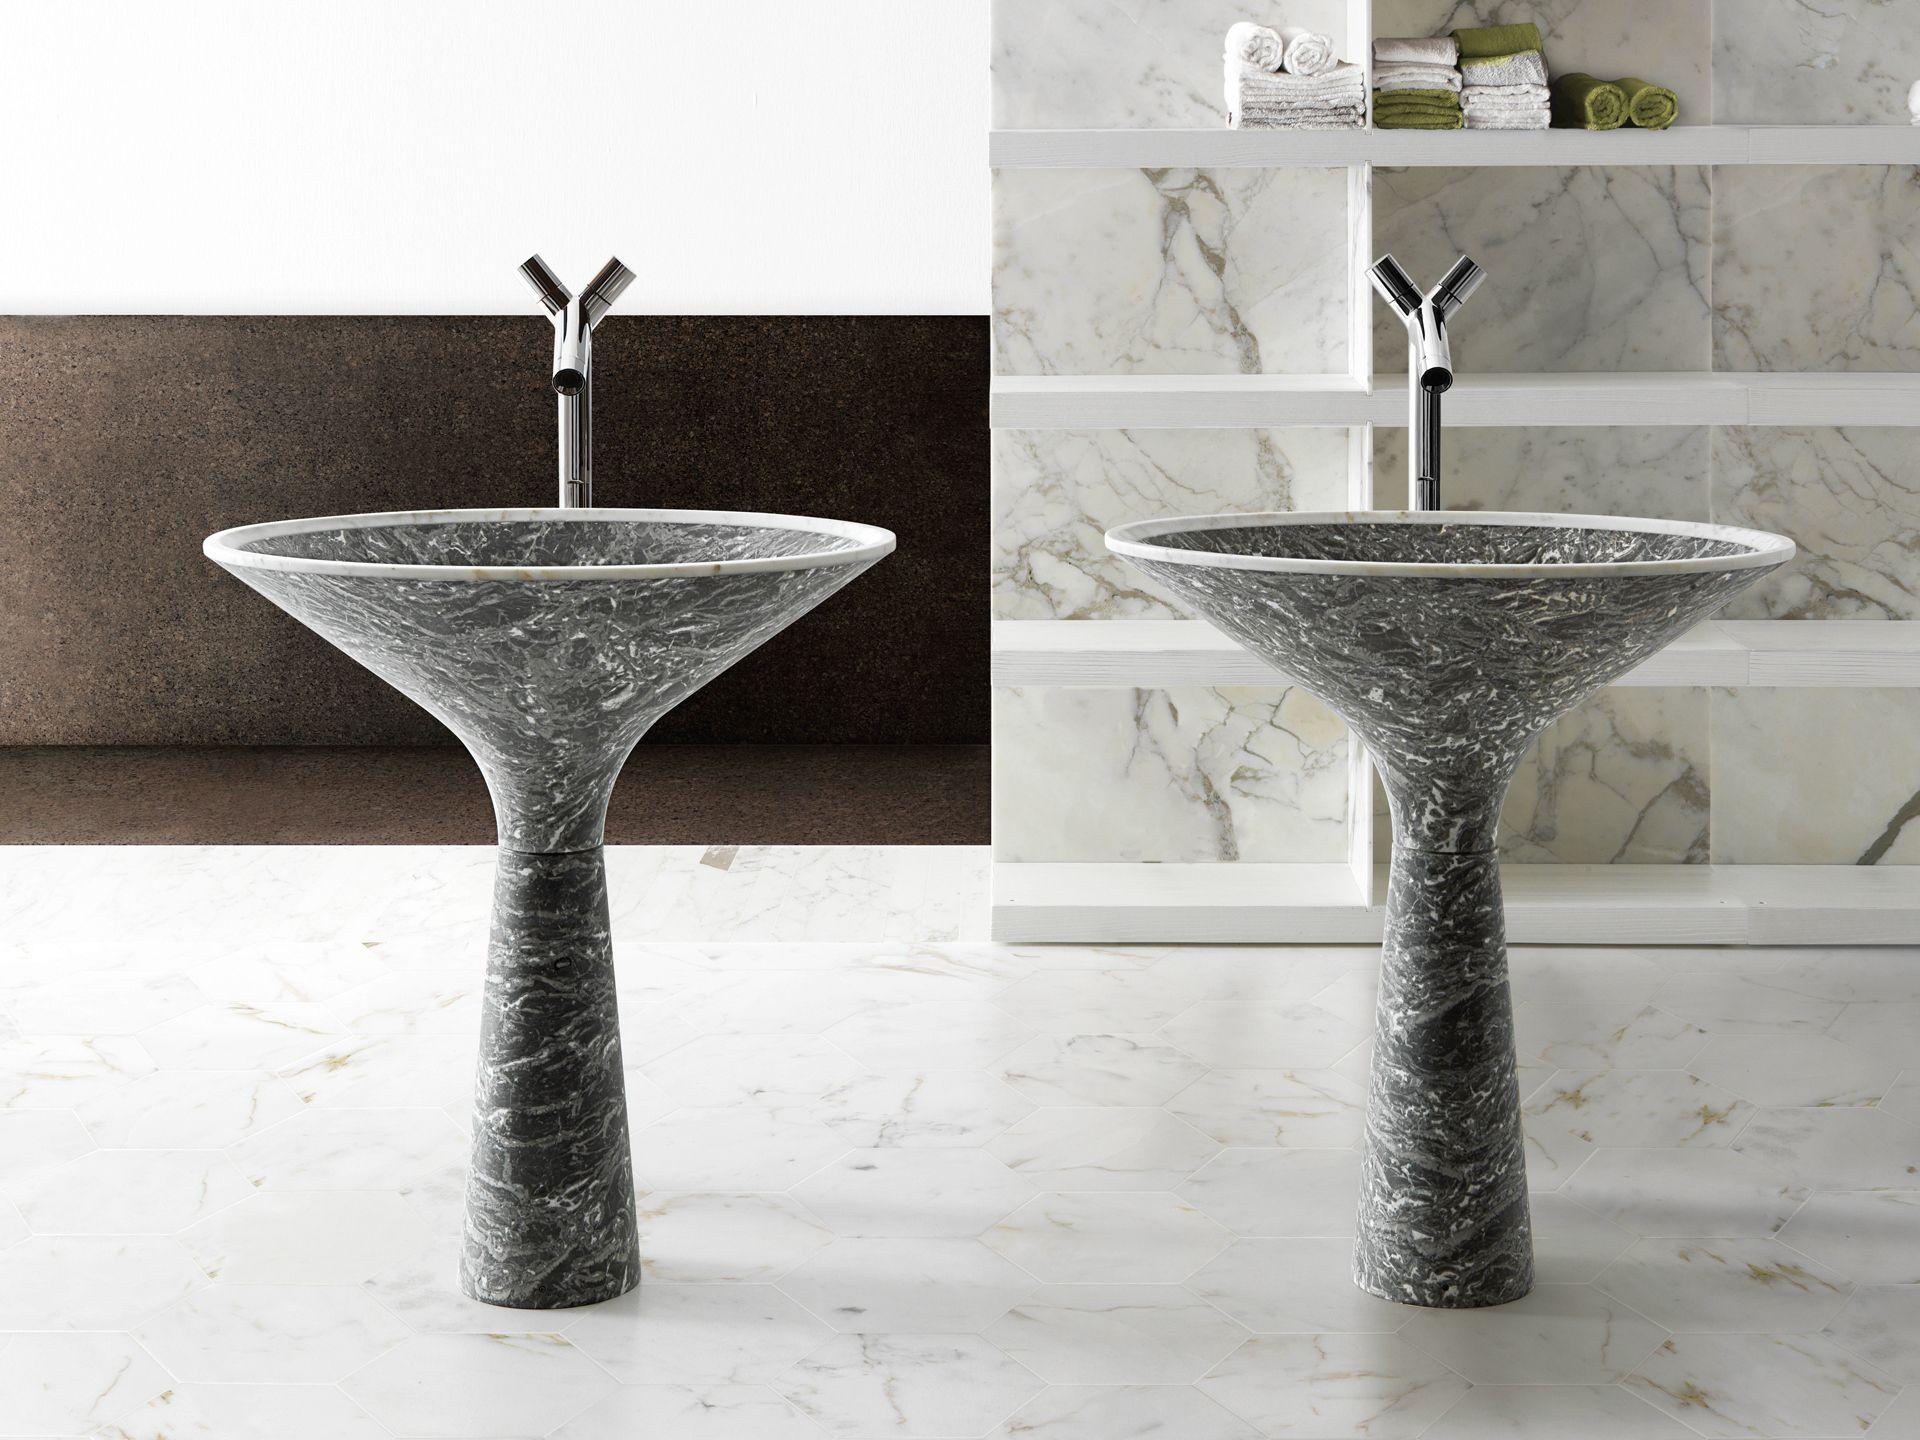 lavabo sur pied ovale en marbre dry by kreoo design enzo berti. Black Bedroom Furniture Sets. Home Design Ideas